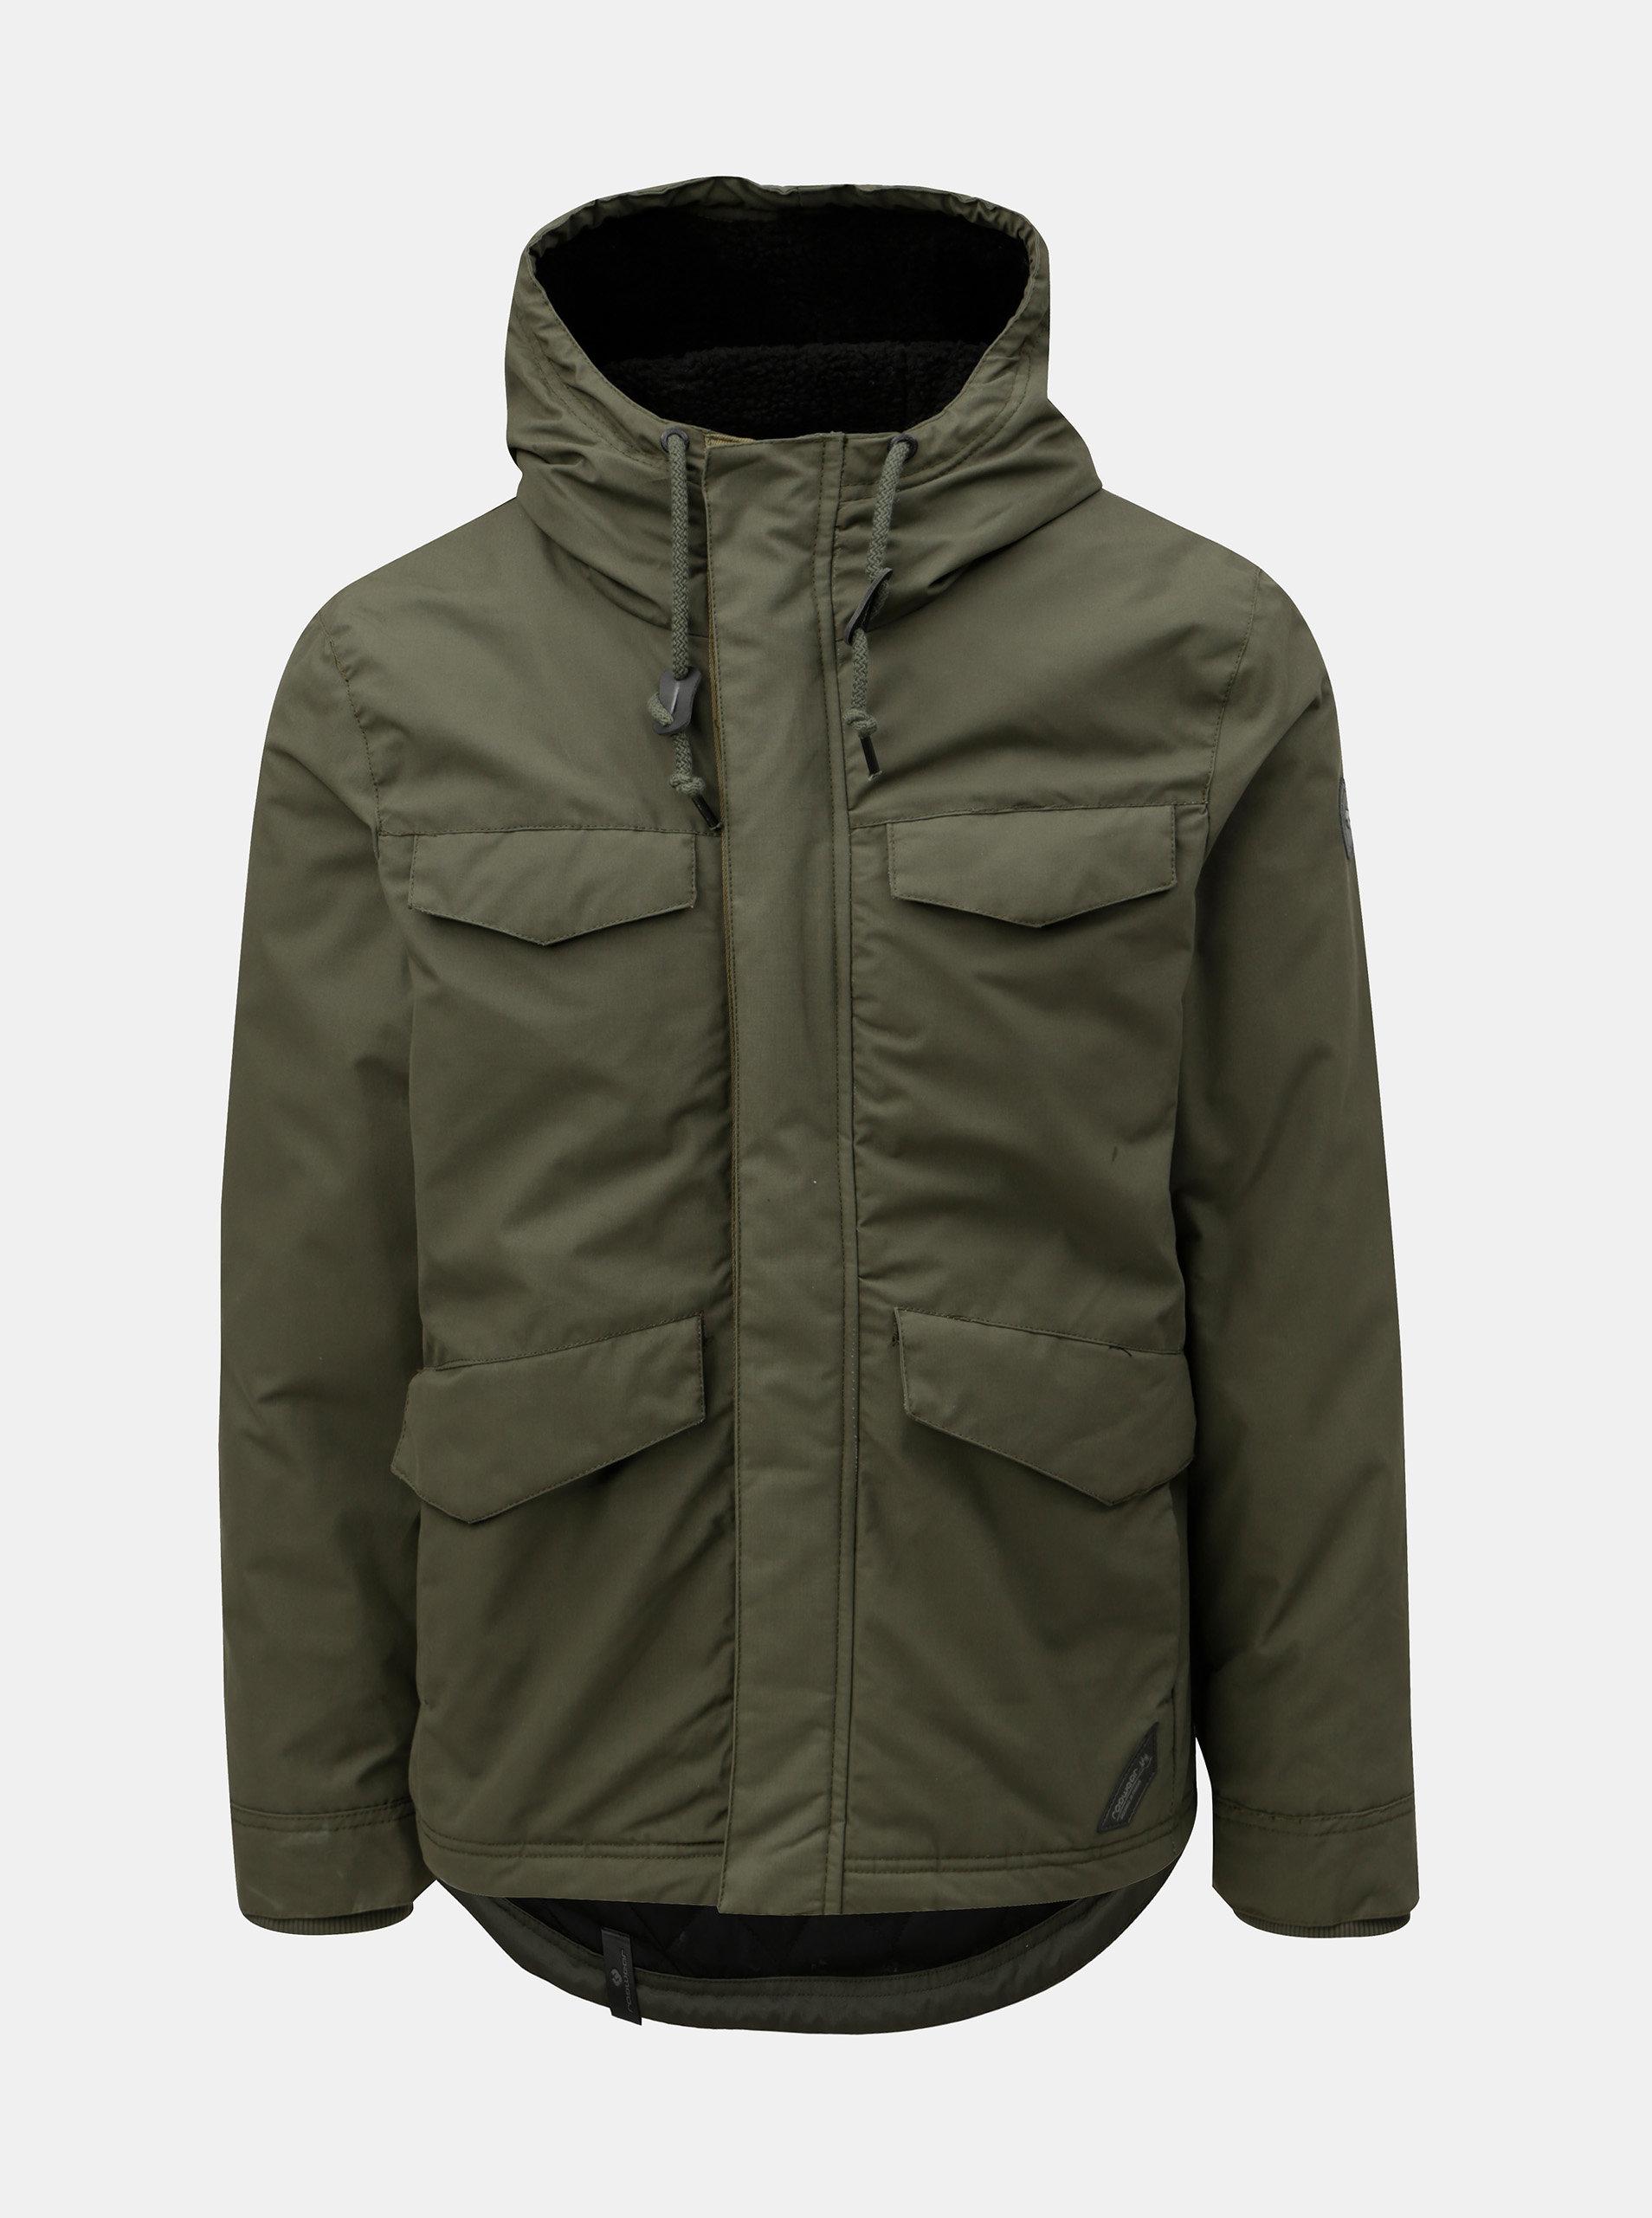 Zelená pánska zimná bunda s kapucňou Ragwear ... a41d99707be